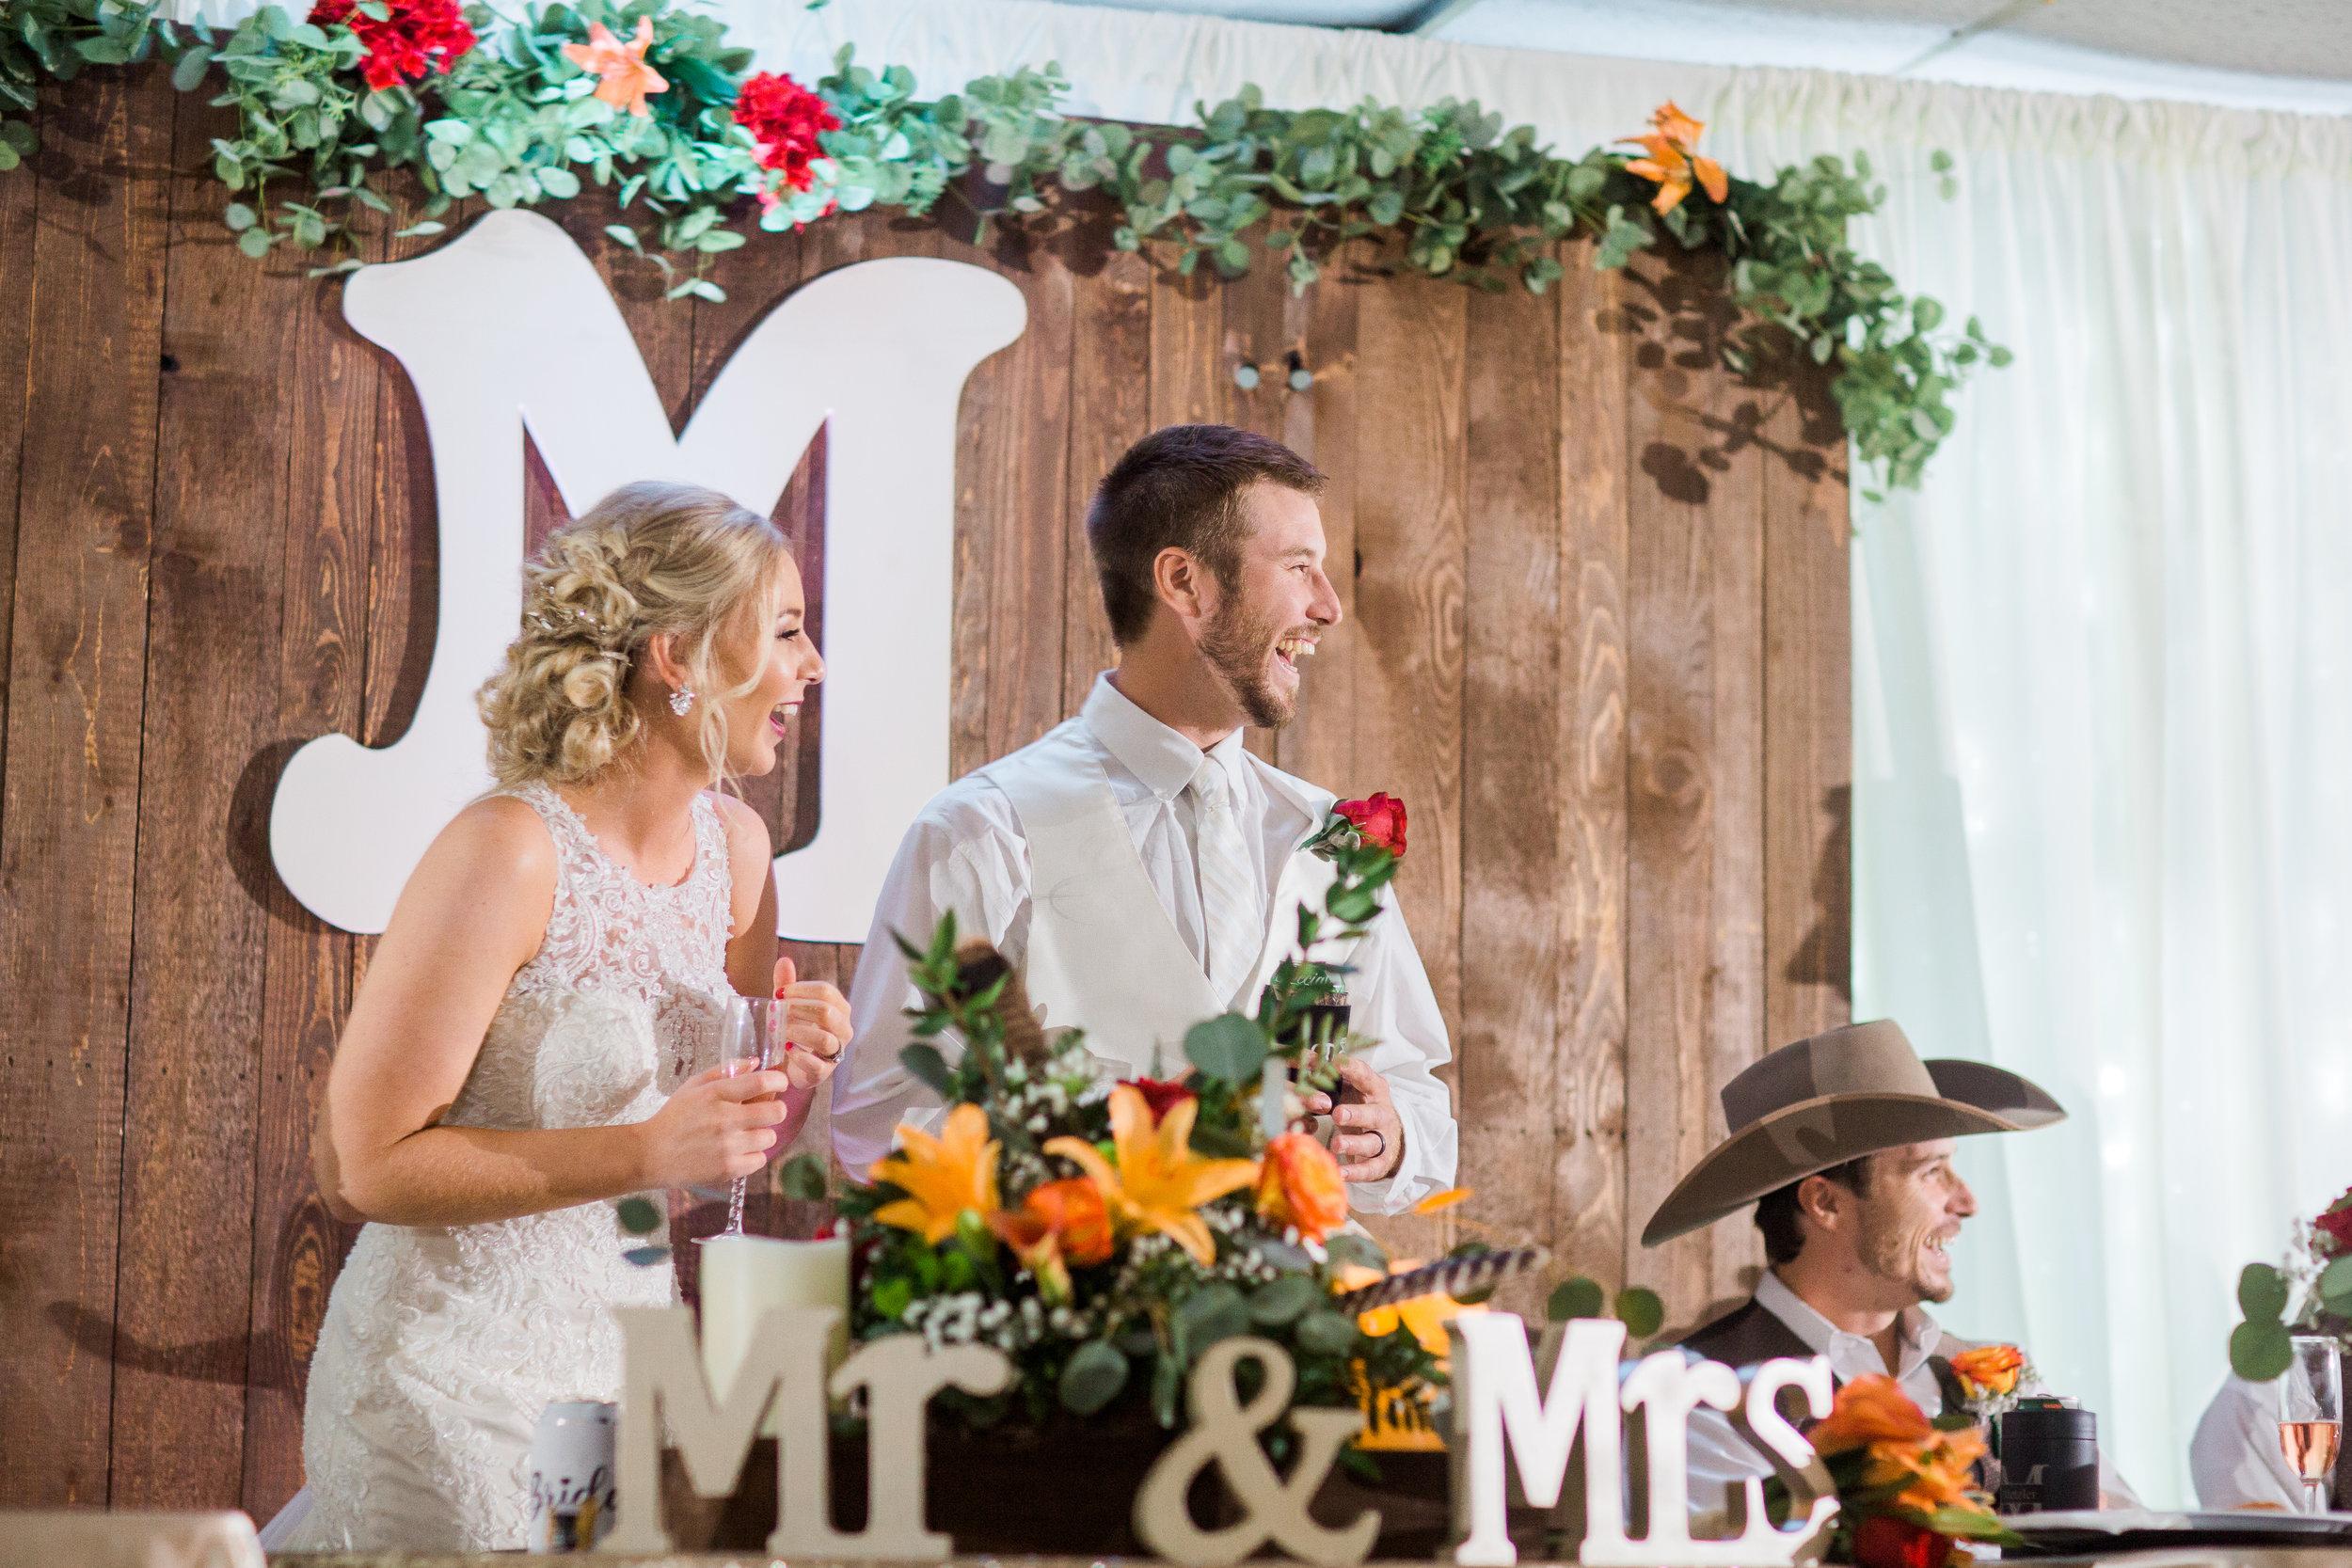 Bailey-Nathan-Windthorst-Texas-Wedding-064.jpg